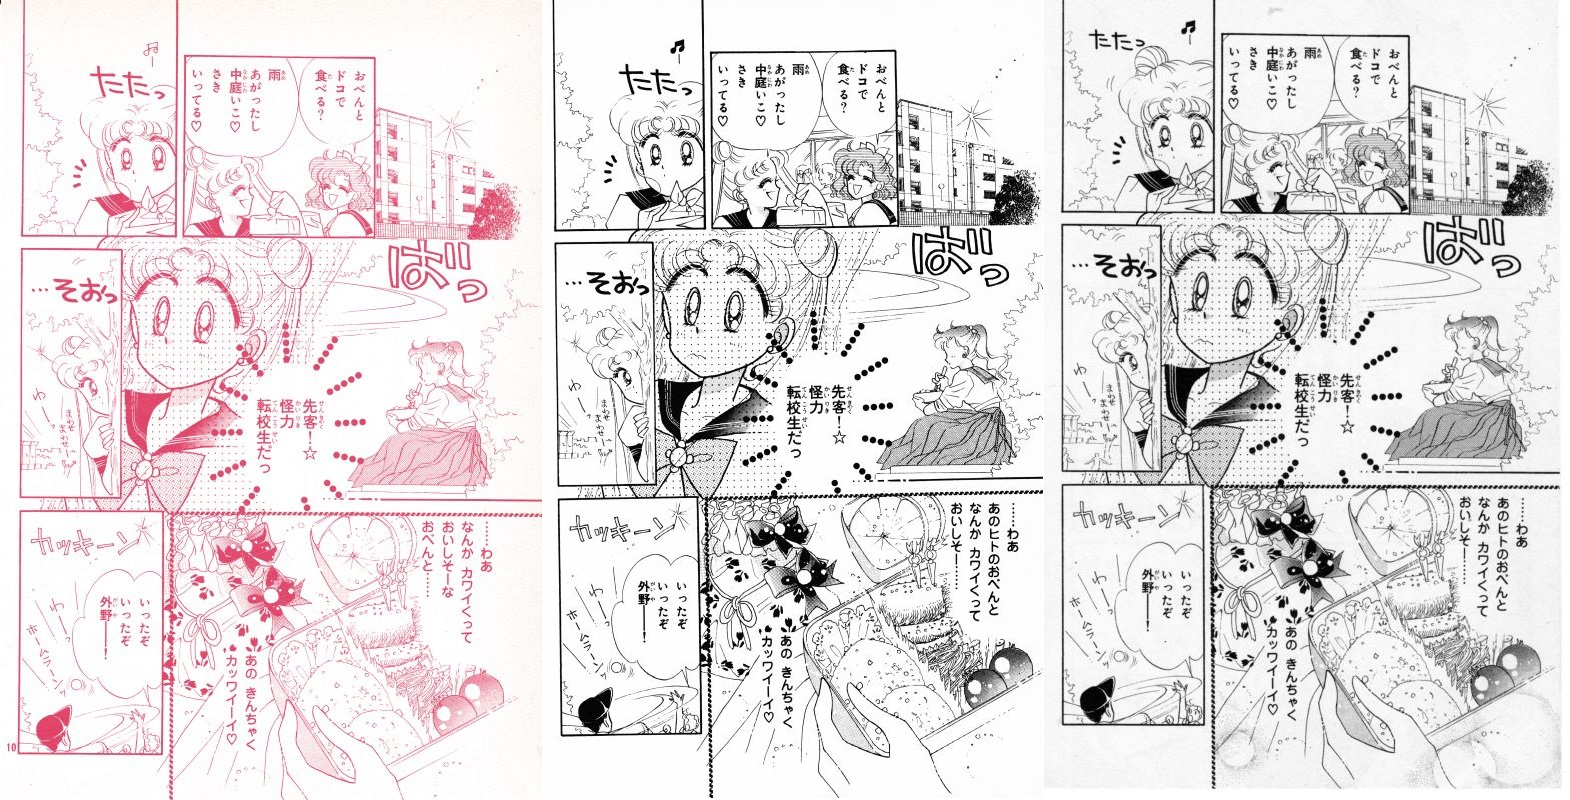 Act 5, Page 8 – Nakayoshi, Original, Remaster